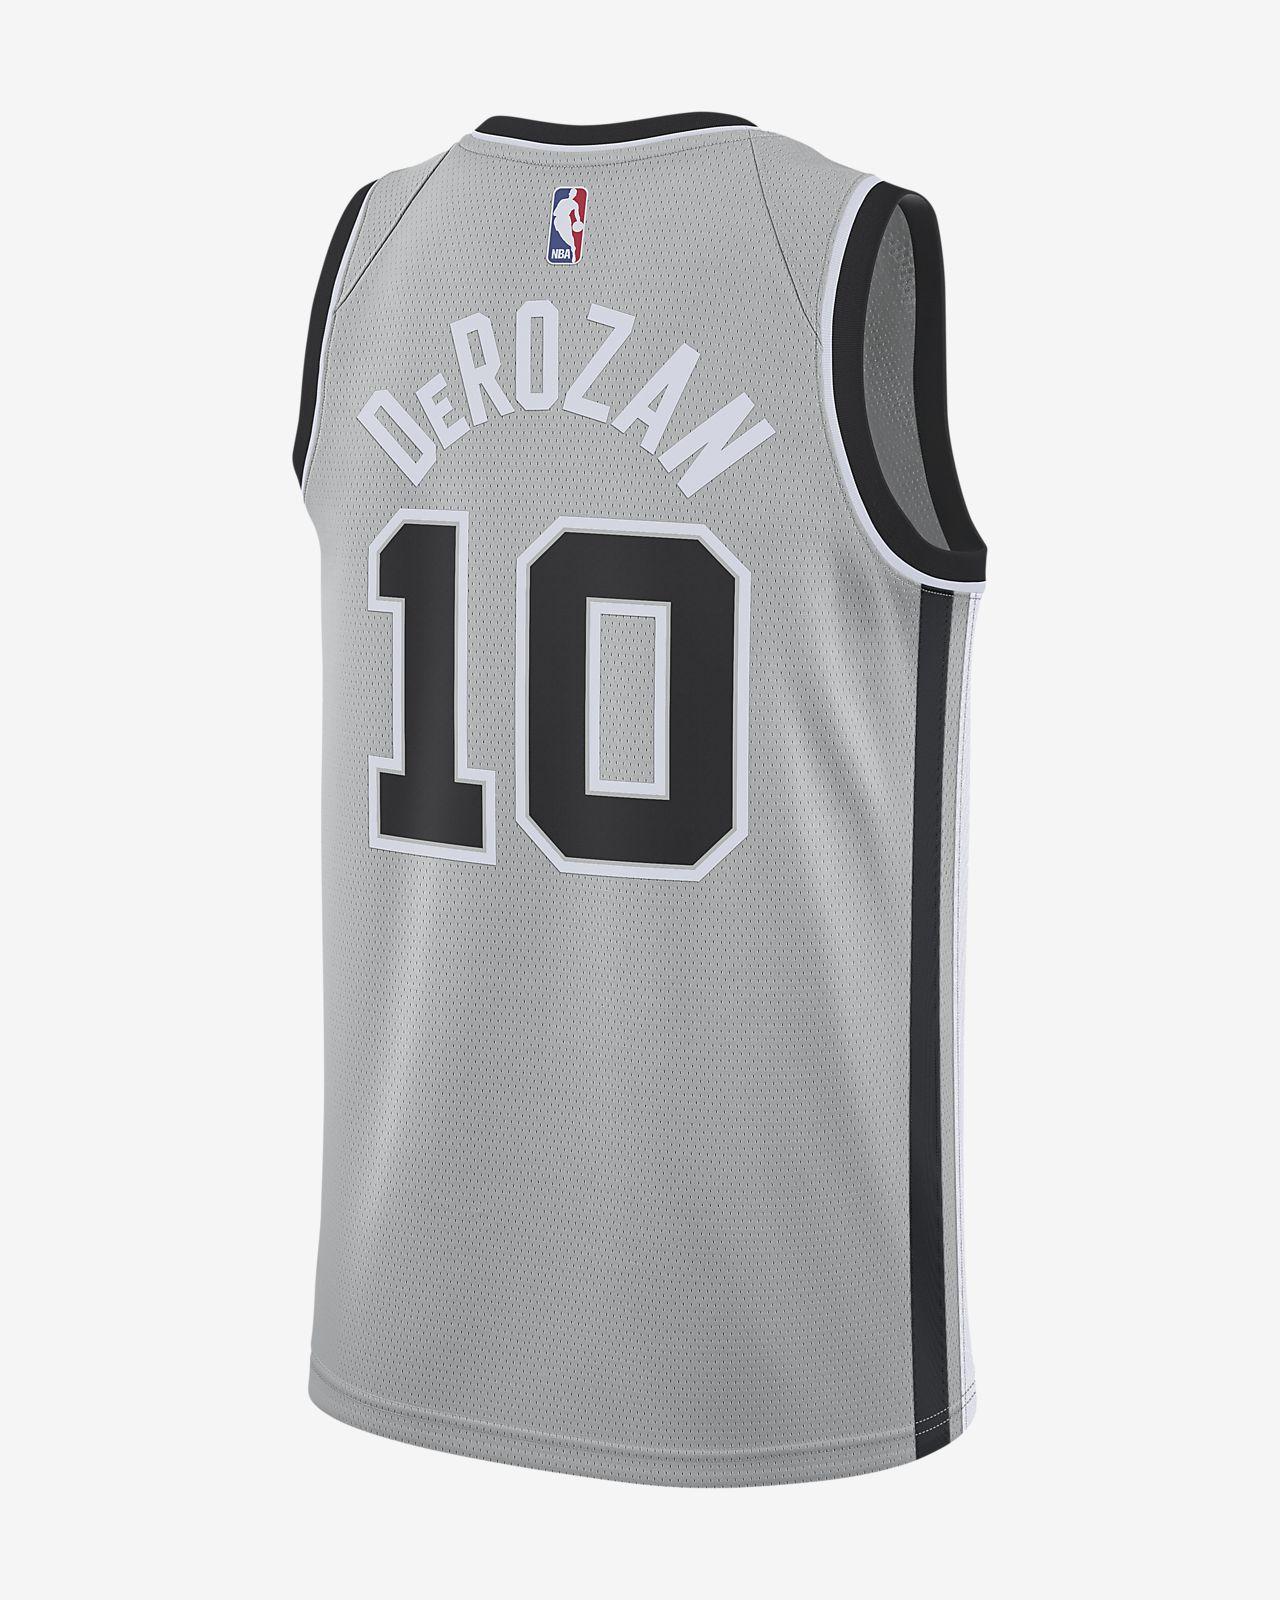 7f6a4c48413 ... DeMar DeRozan Statement Edition Swingman (San Antonio Spurs) Men's Nike  NBA Connected Jersey